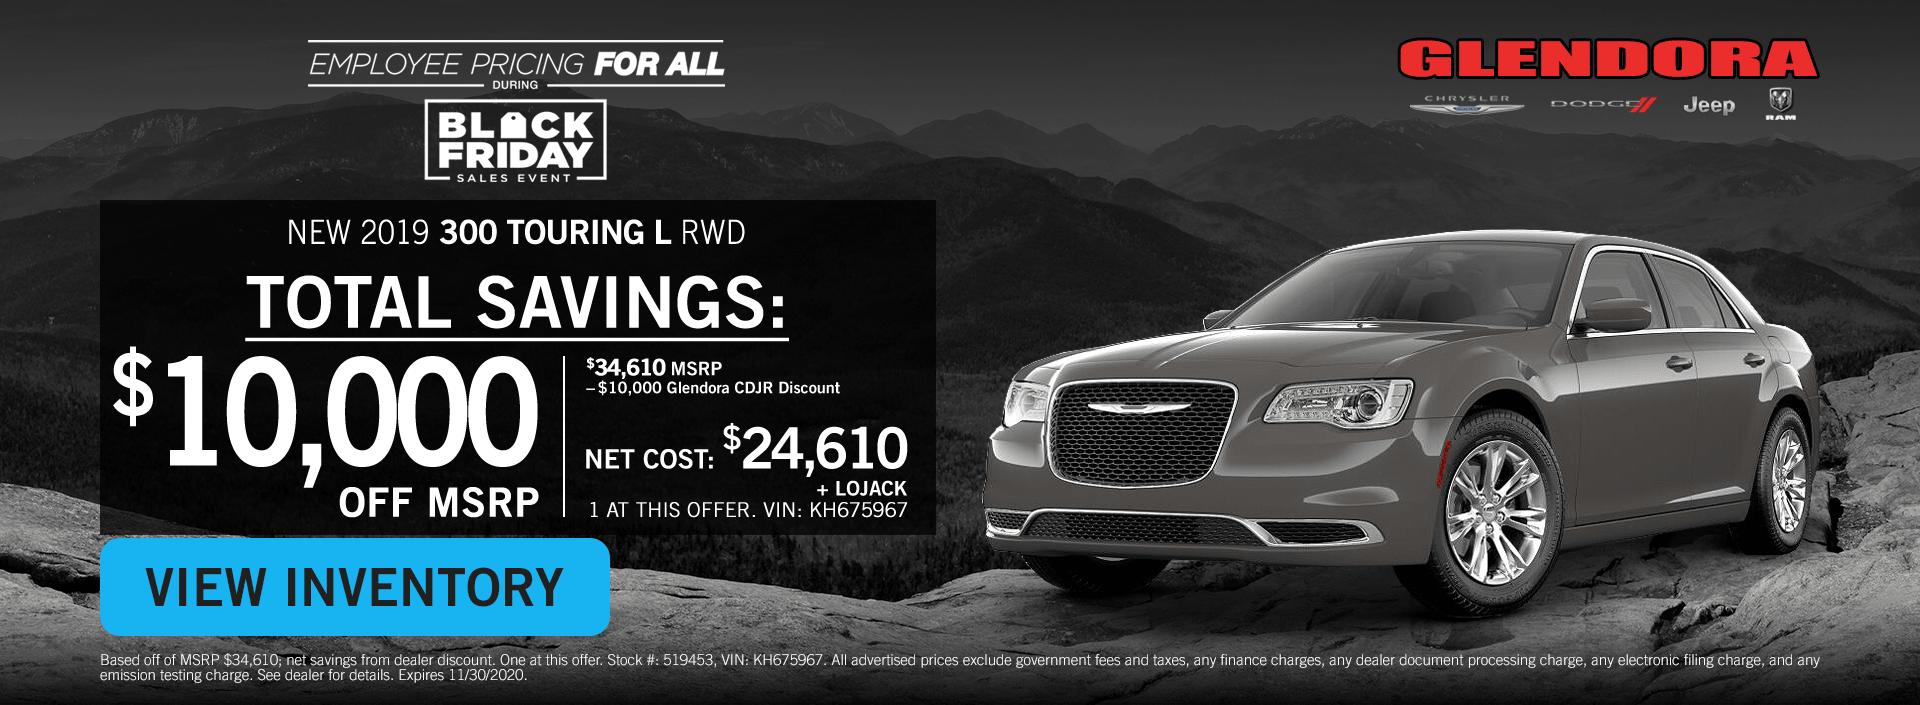 Black Friday Chrysler 300 Deals Chrysler 300 Special